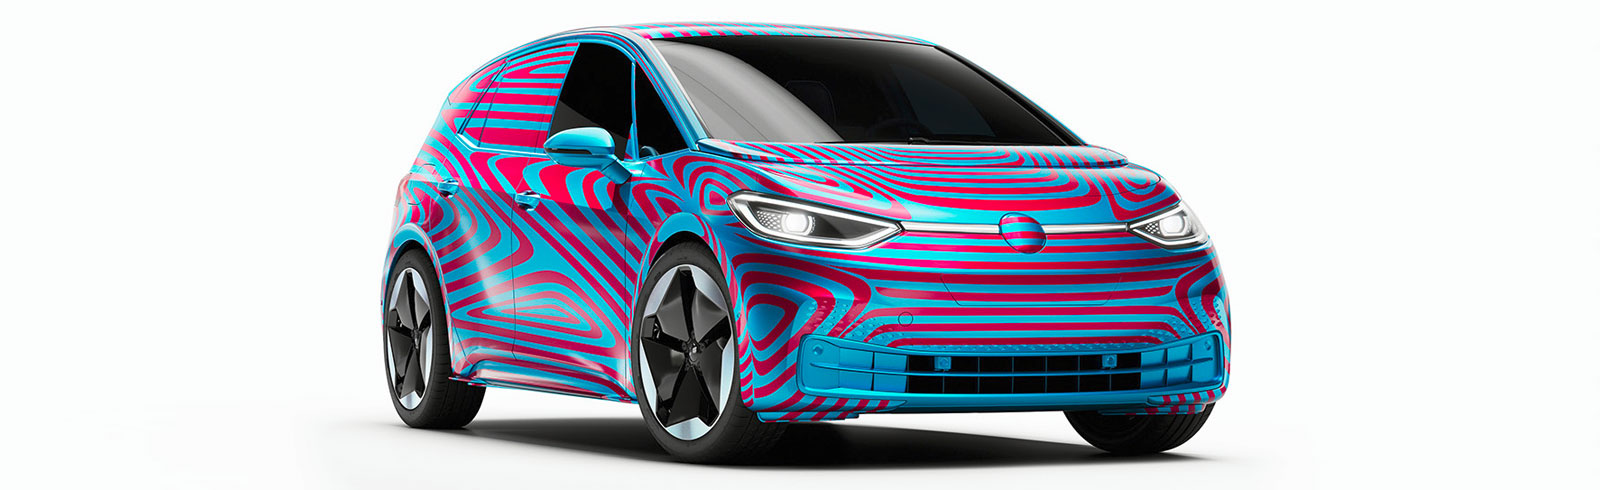 Volkswagen has begun production of ID.3 components in Germany